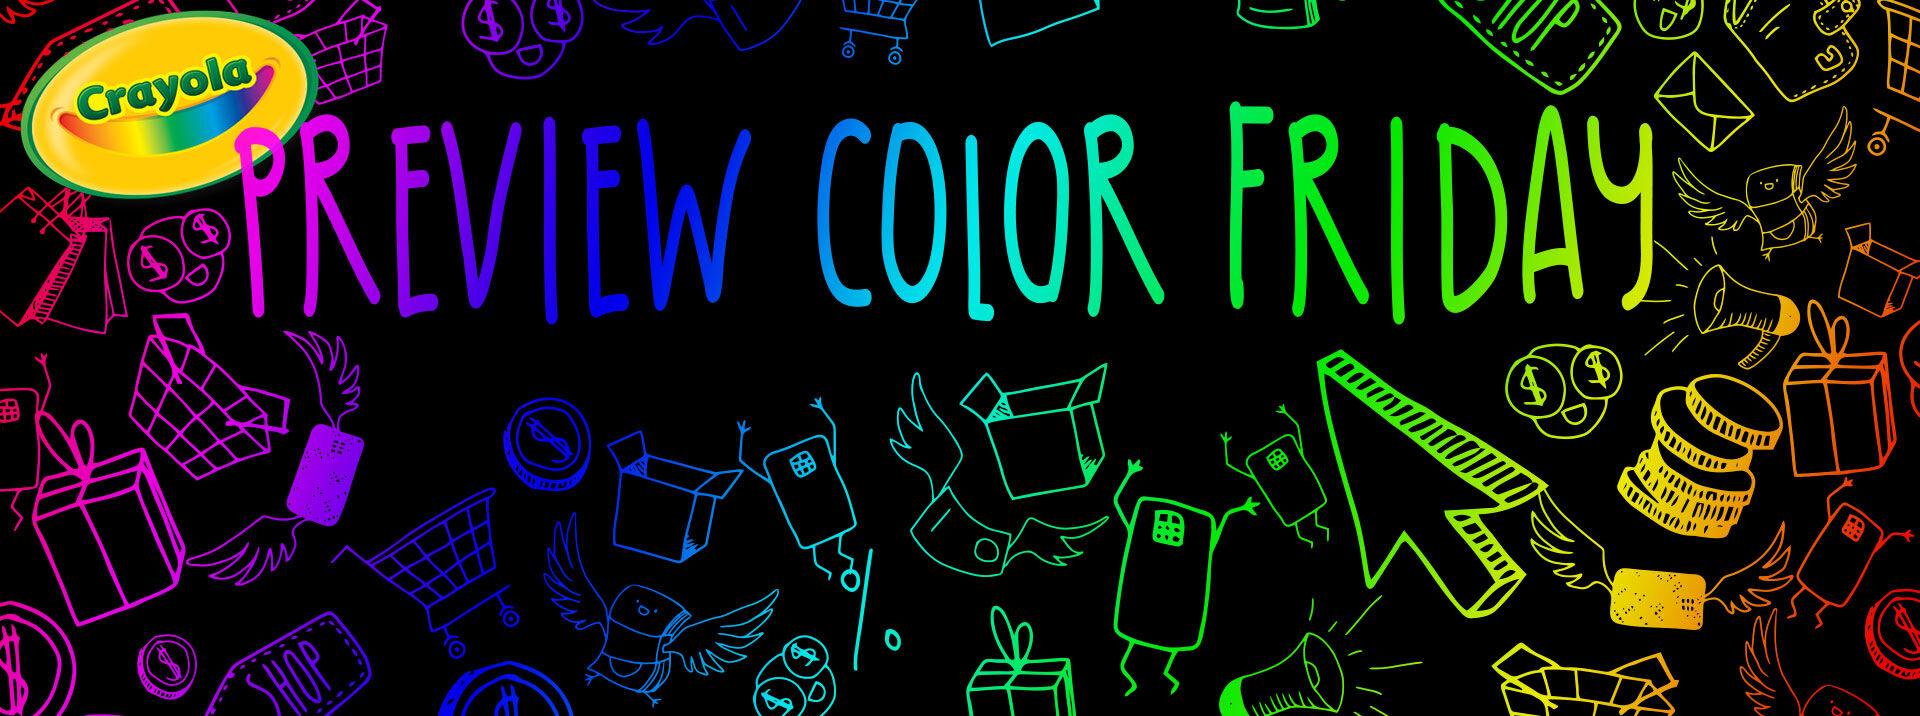 Crayola Black Friday